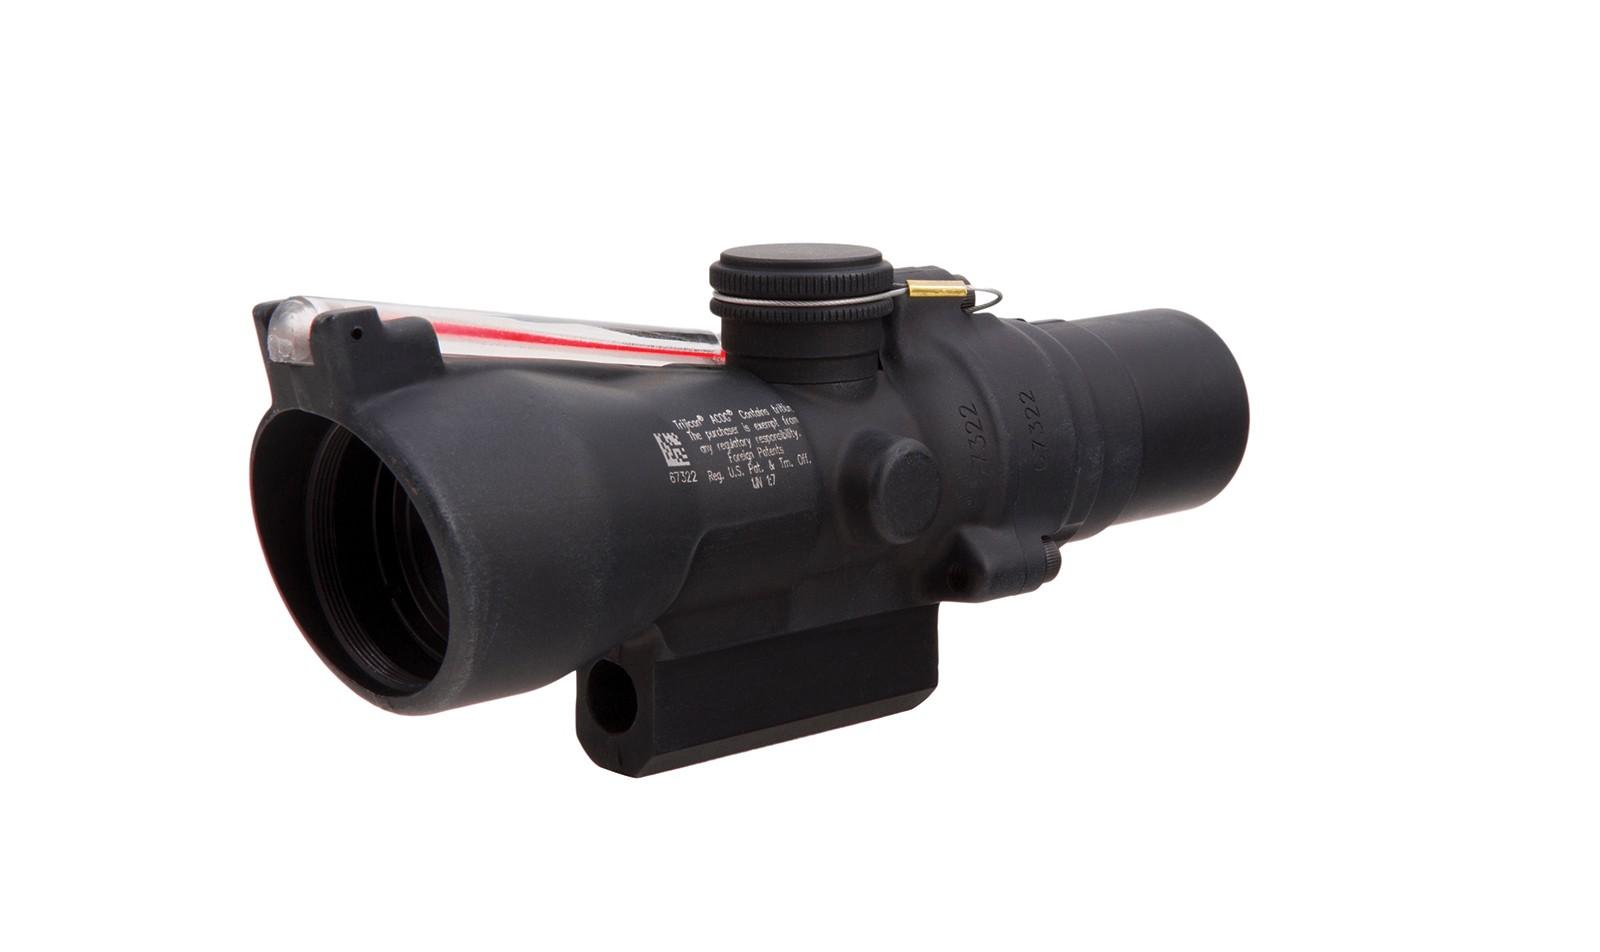 Trijicon ACOG® 2x20 BAC Riflescope